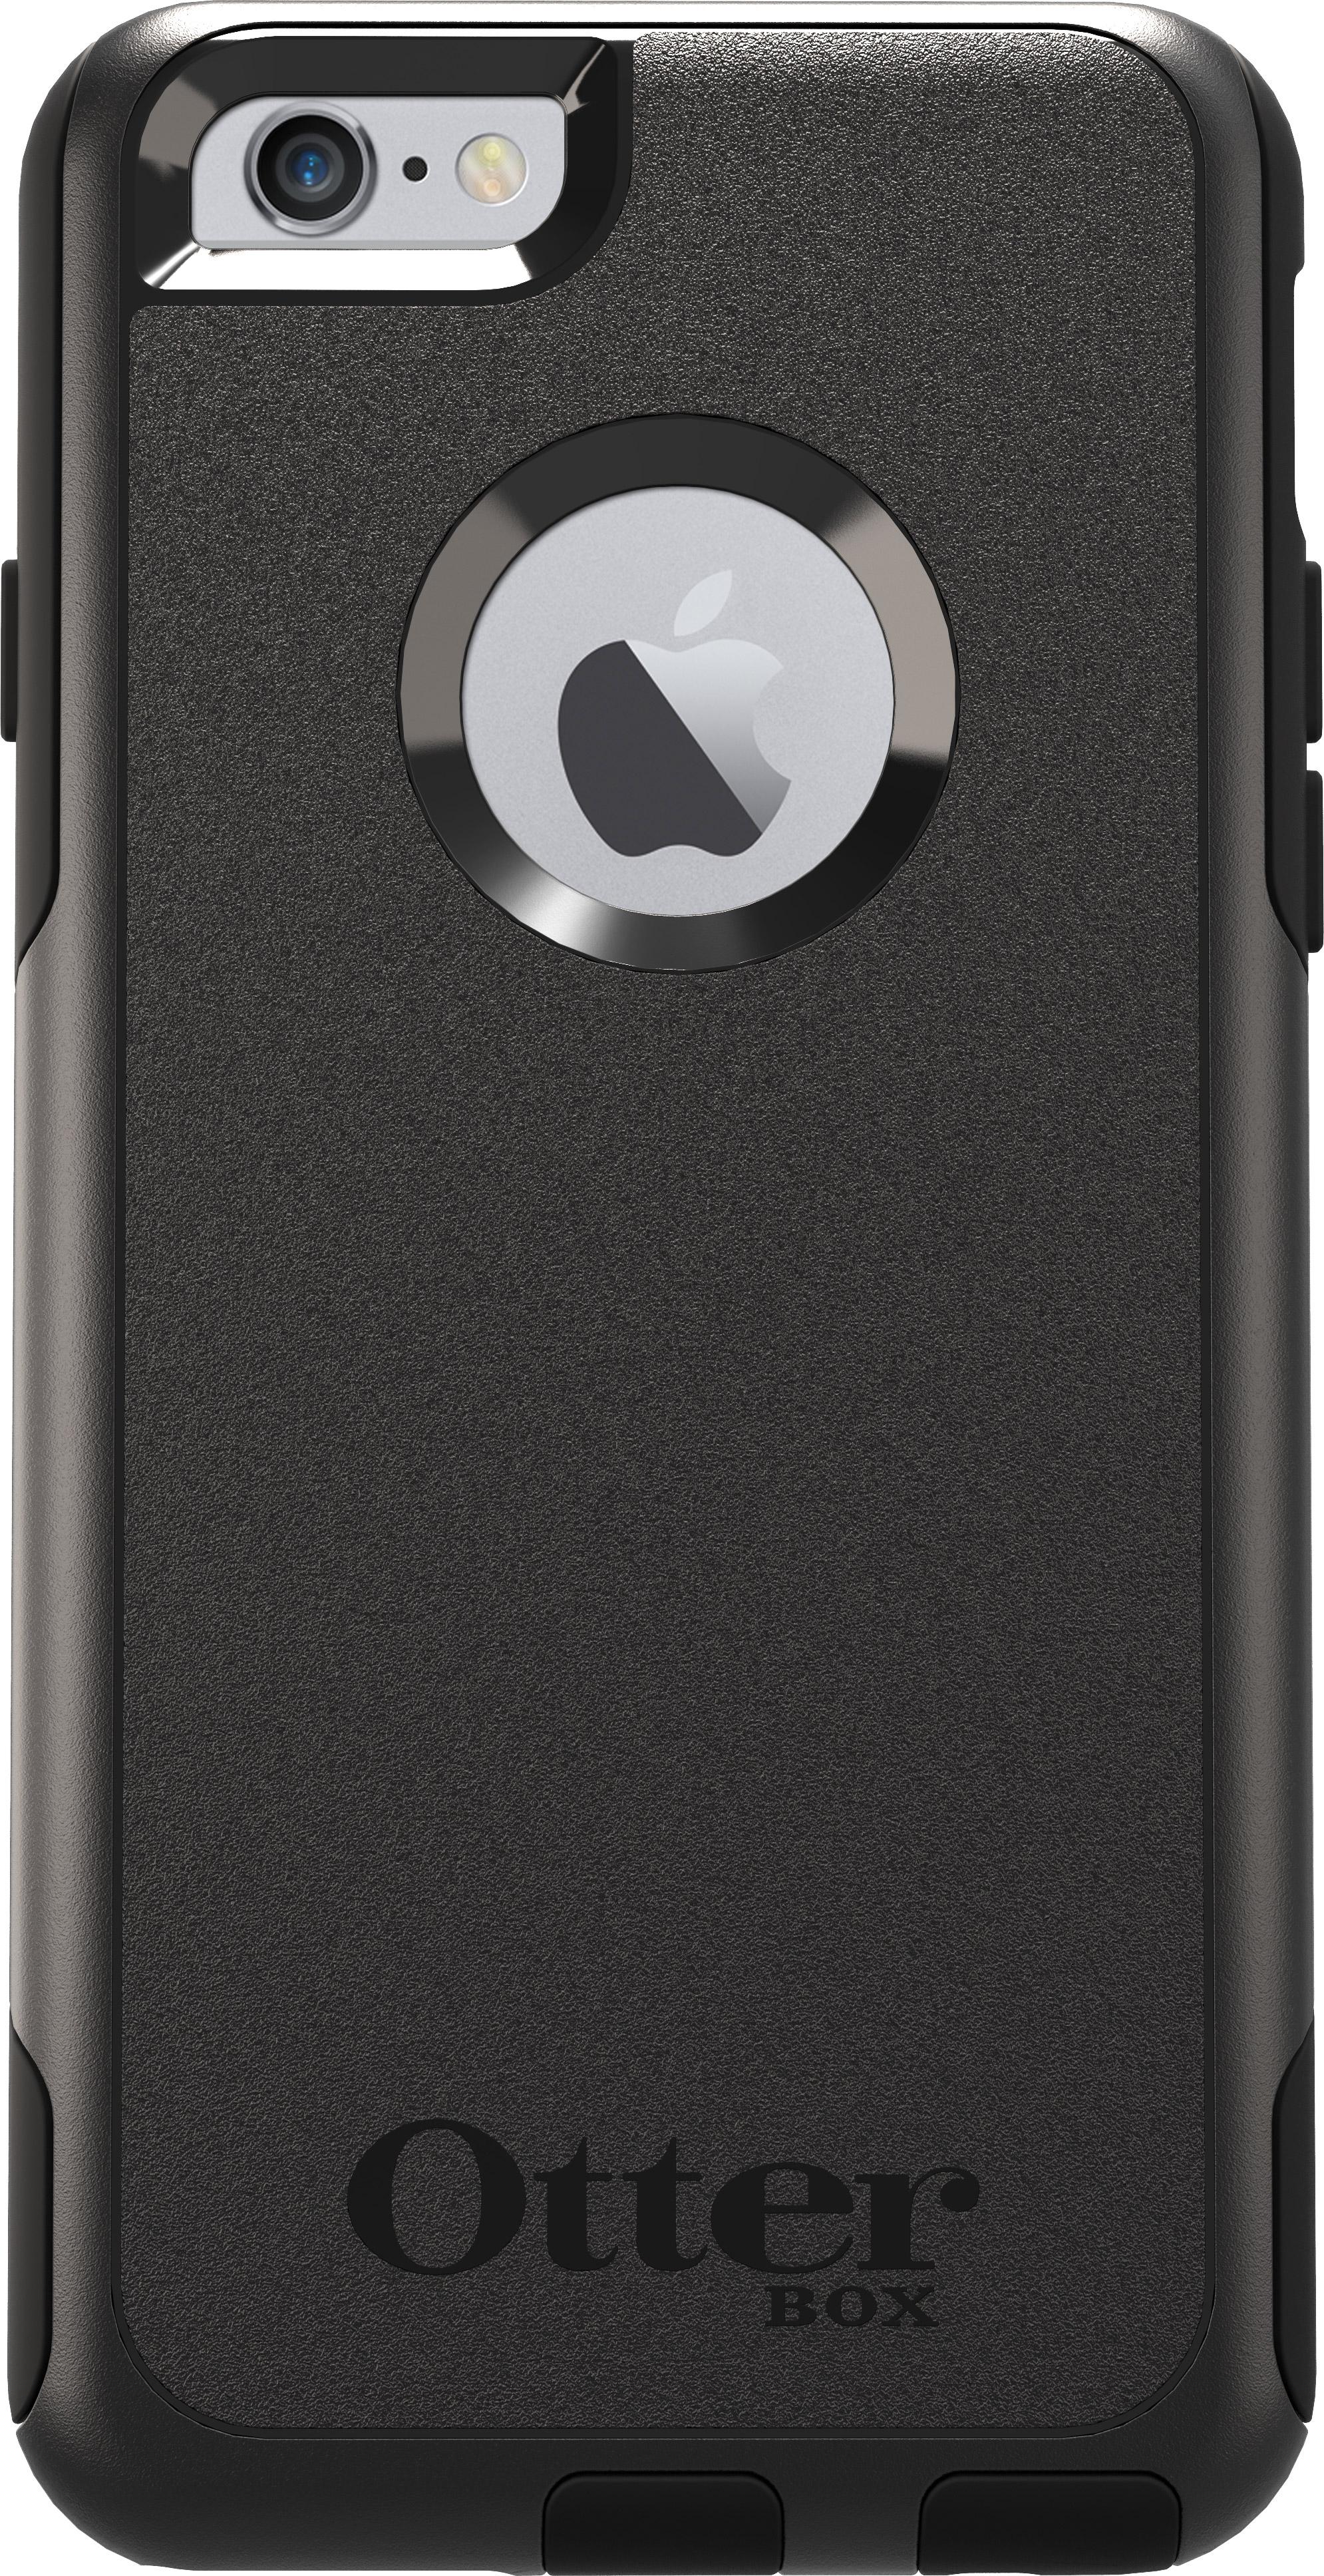 OtterBox iPhone 6s plus case - Commuter Series